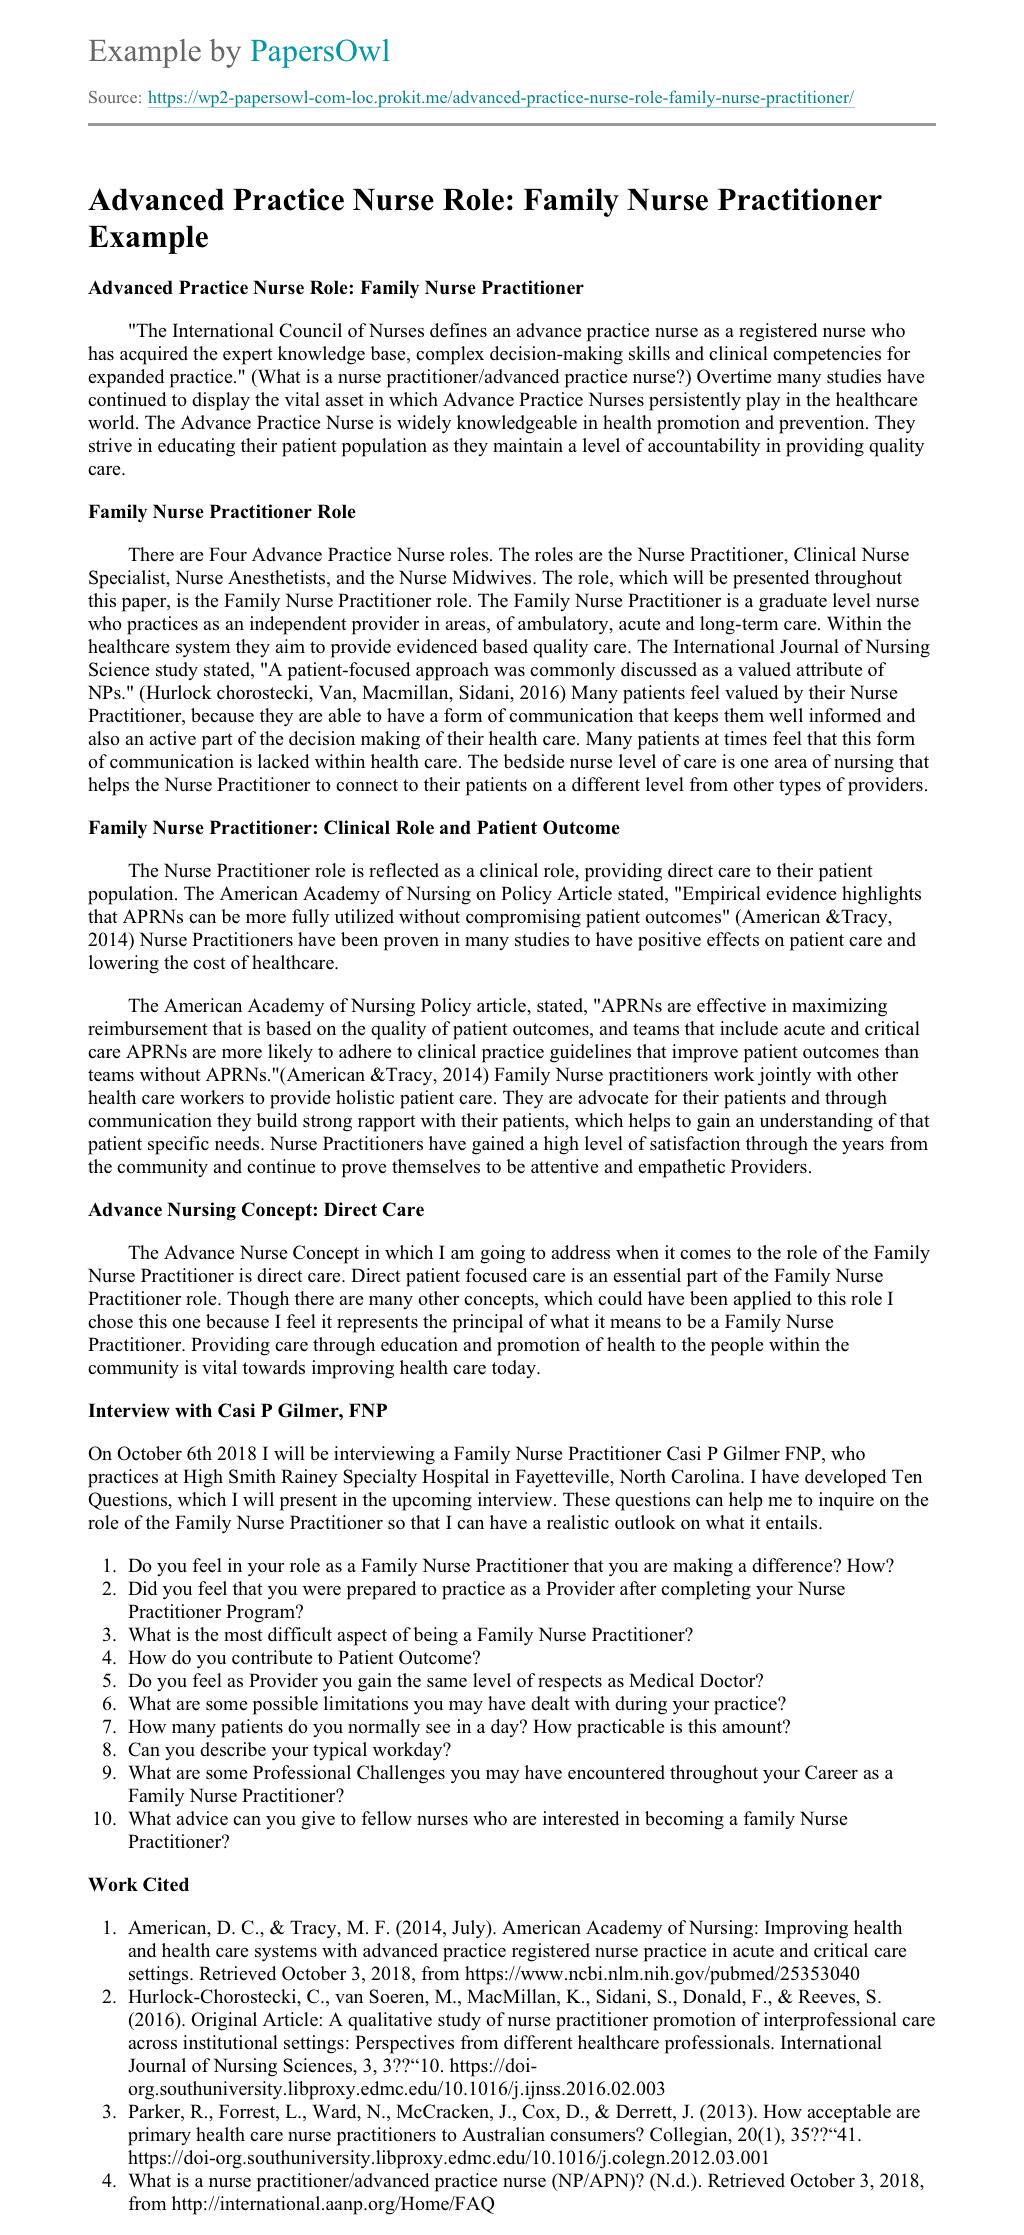 Writing custom vows